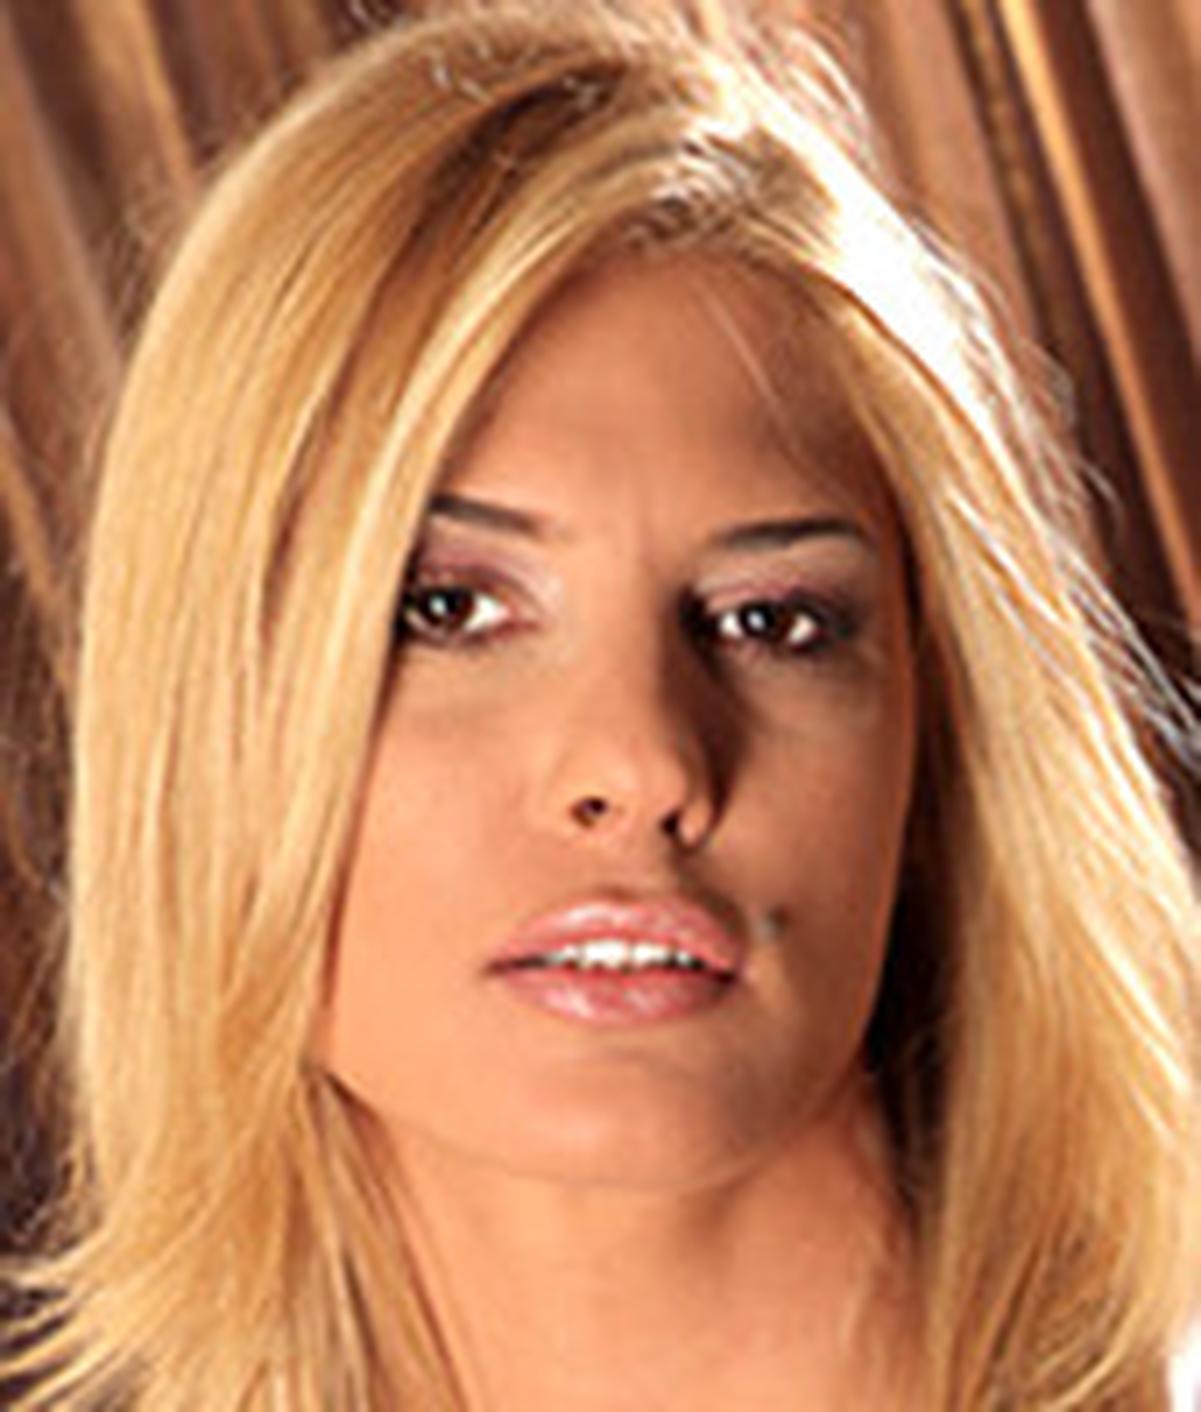 Nadia Macri wiki, Nadia Macri bio, Nadia Macri news